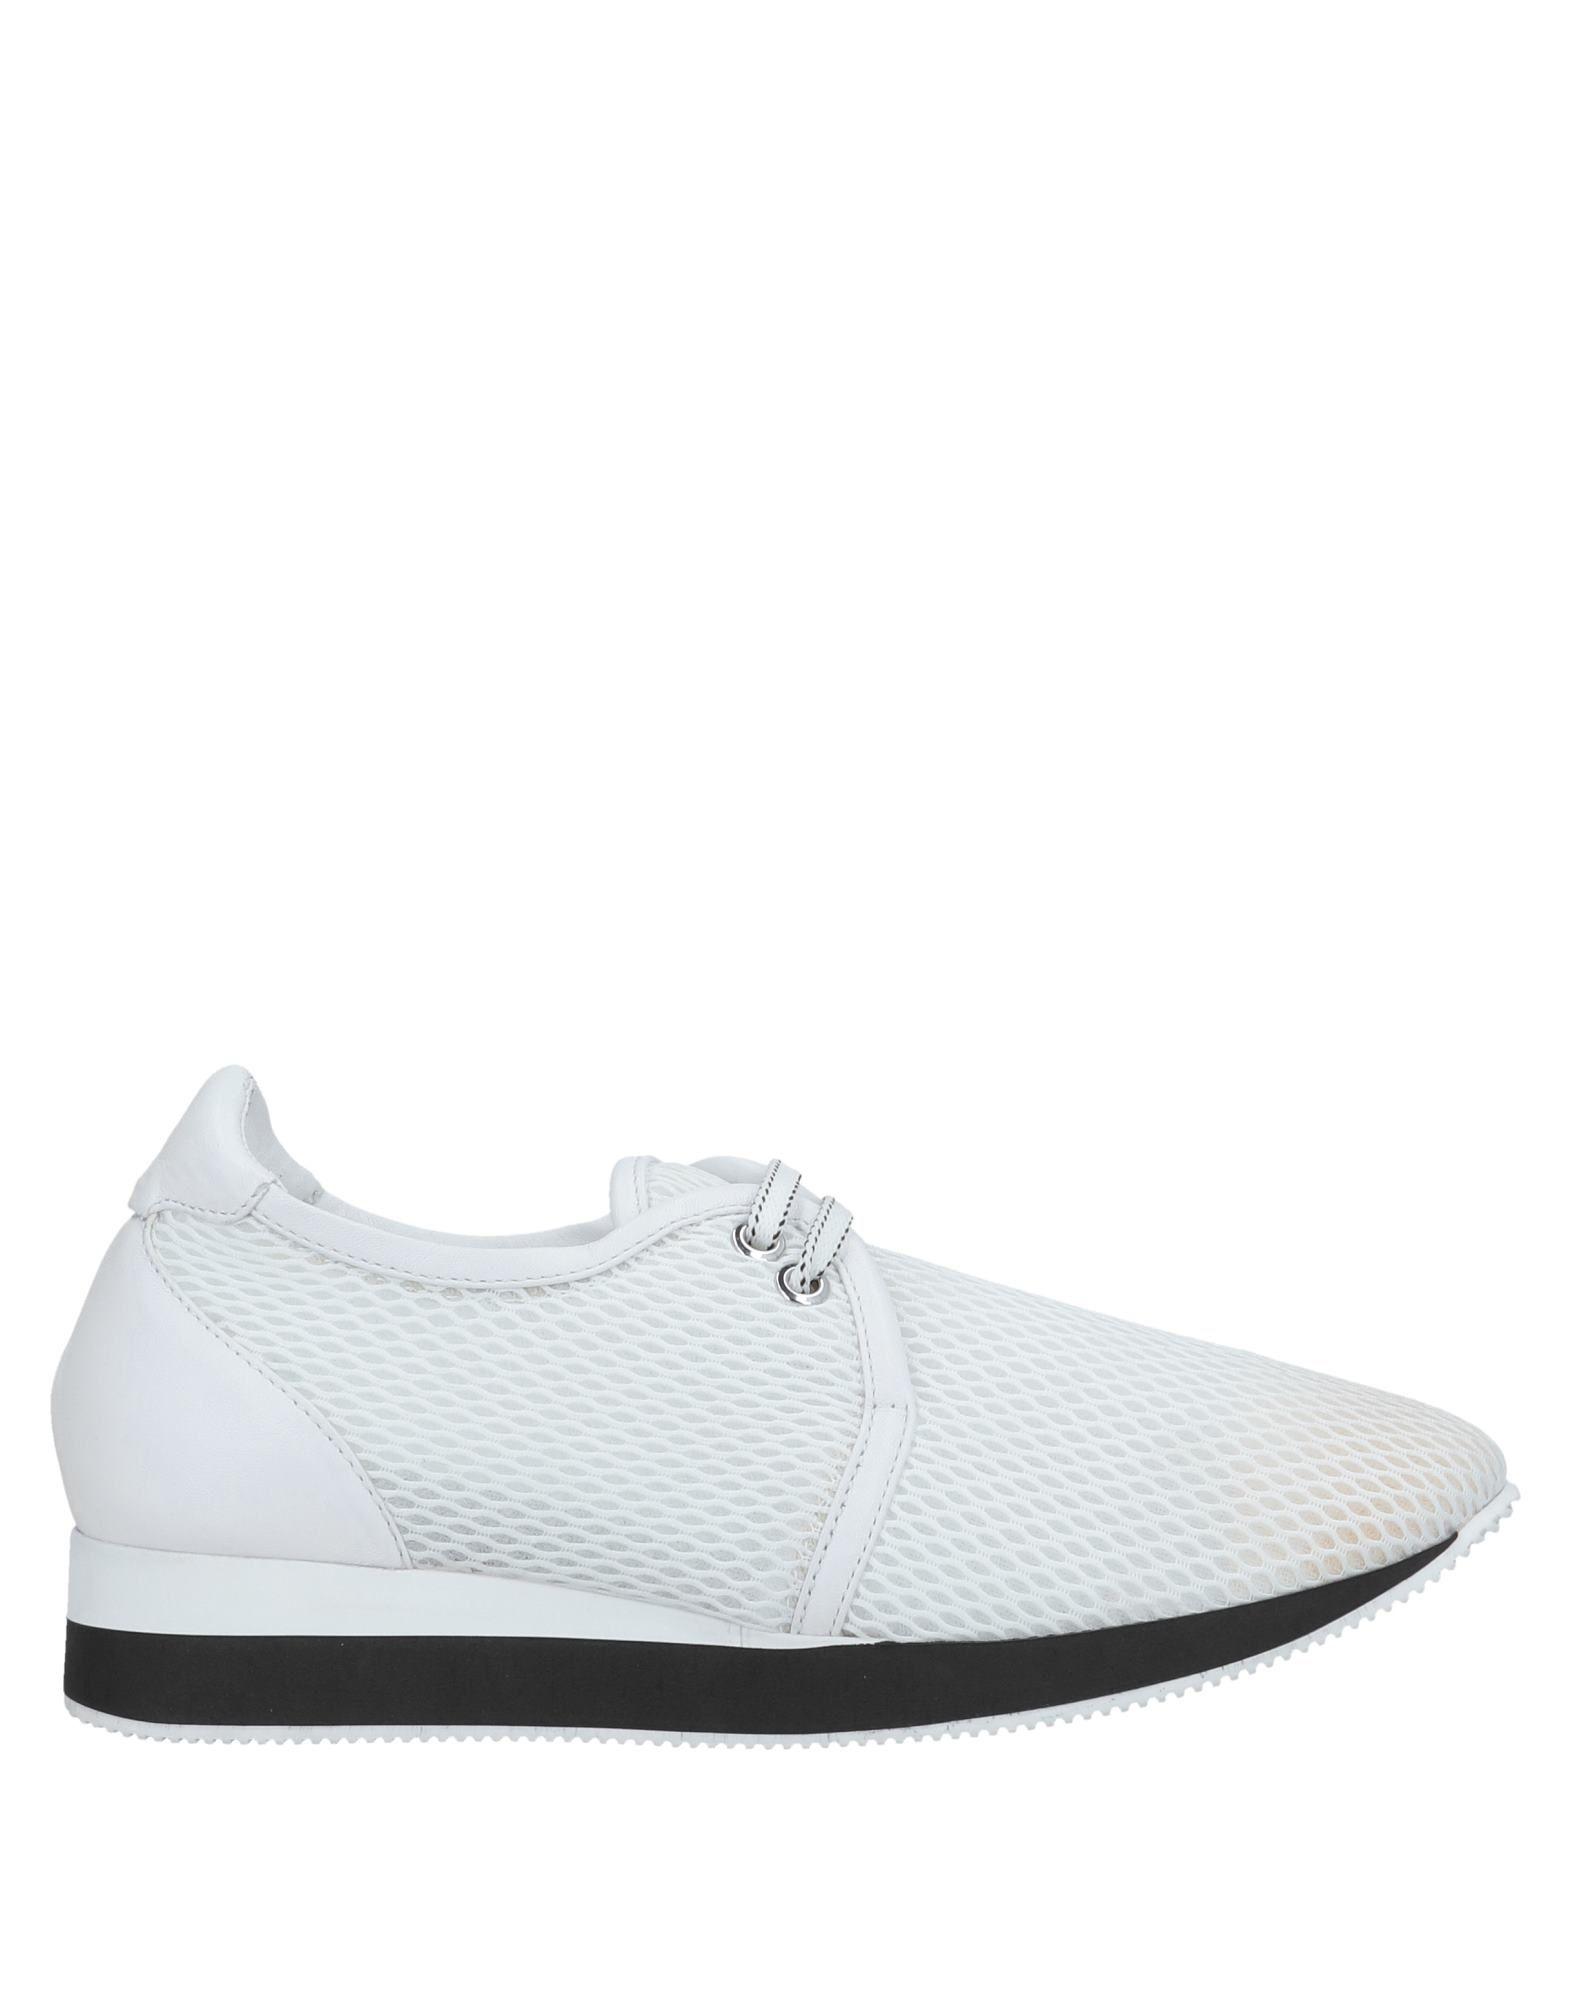 Stilvolle Sneakers billige Schuhe Max Mara Sneakers Stilvolle Damen  11554937NR 7b18f7